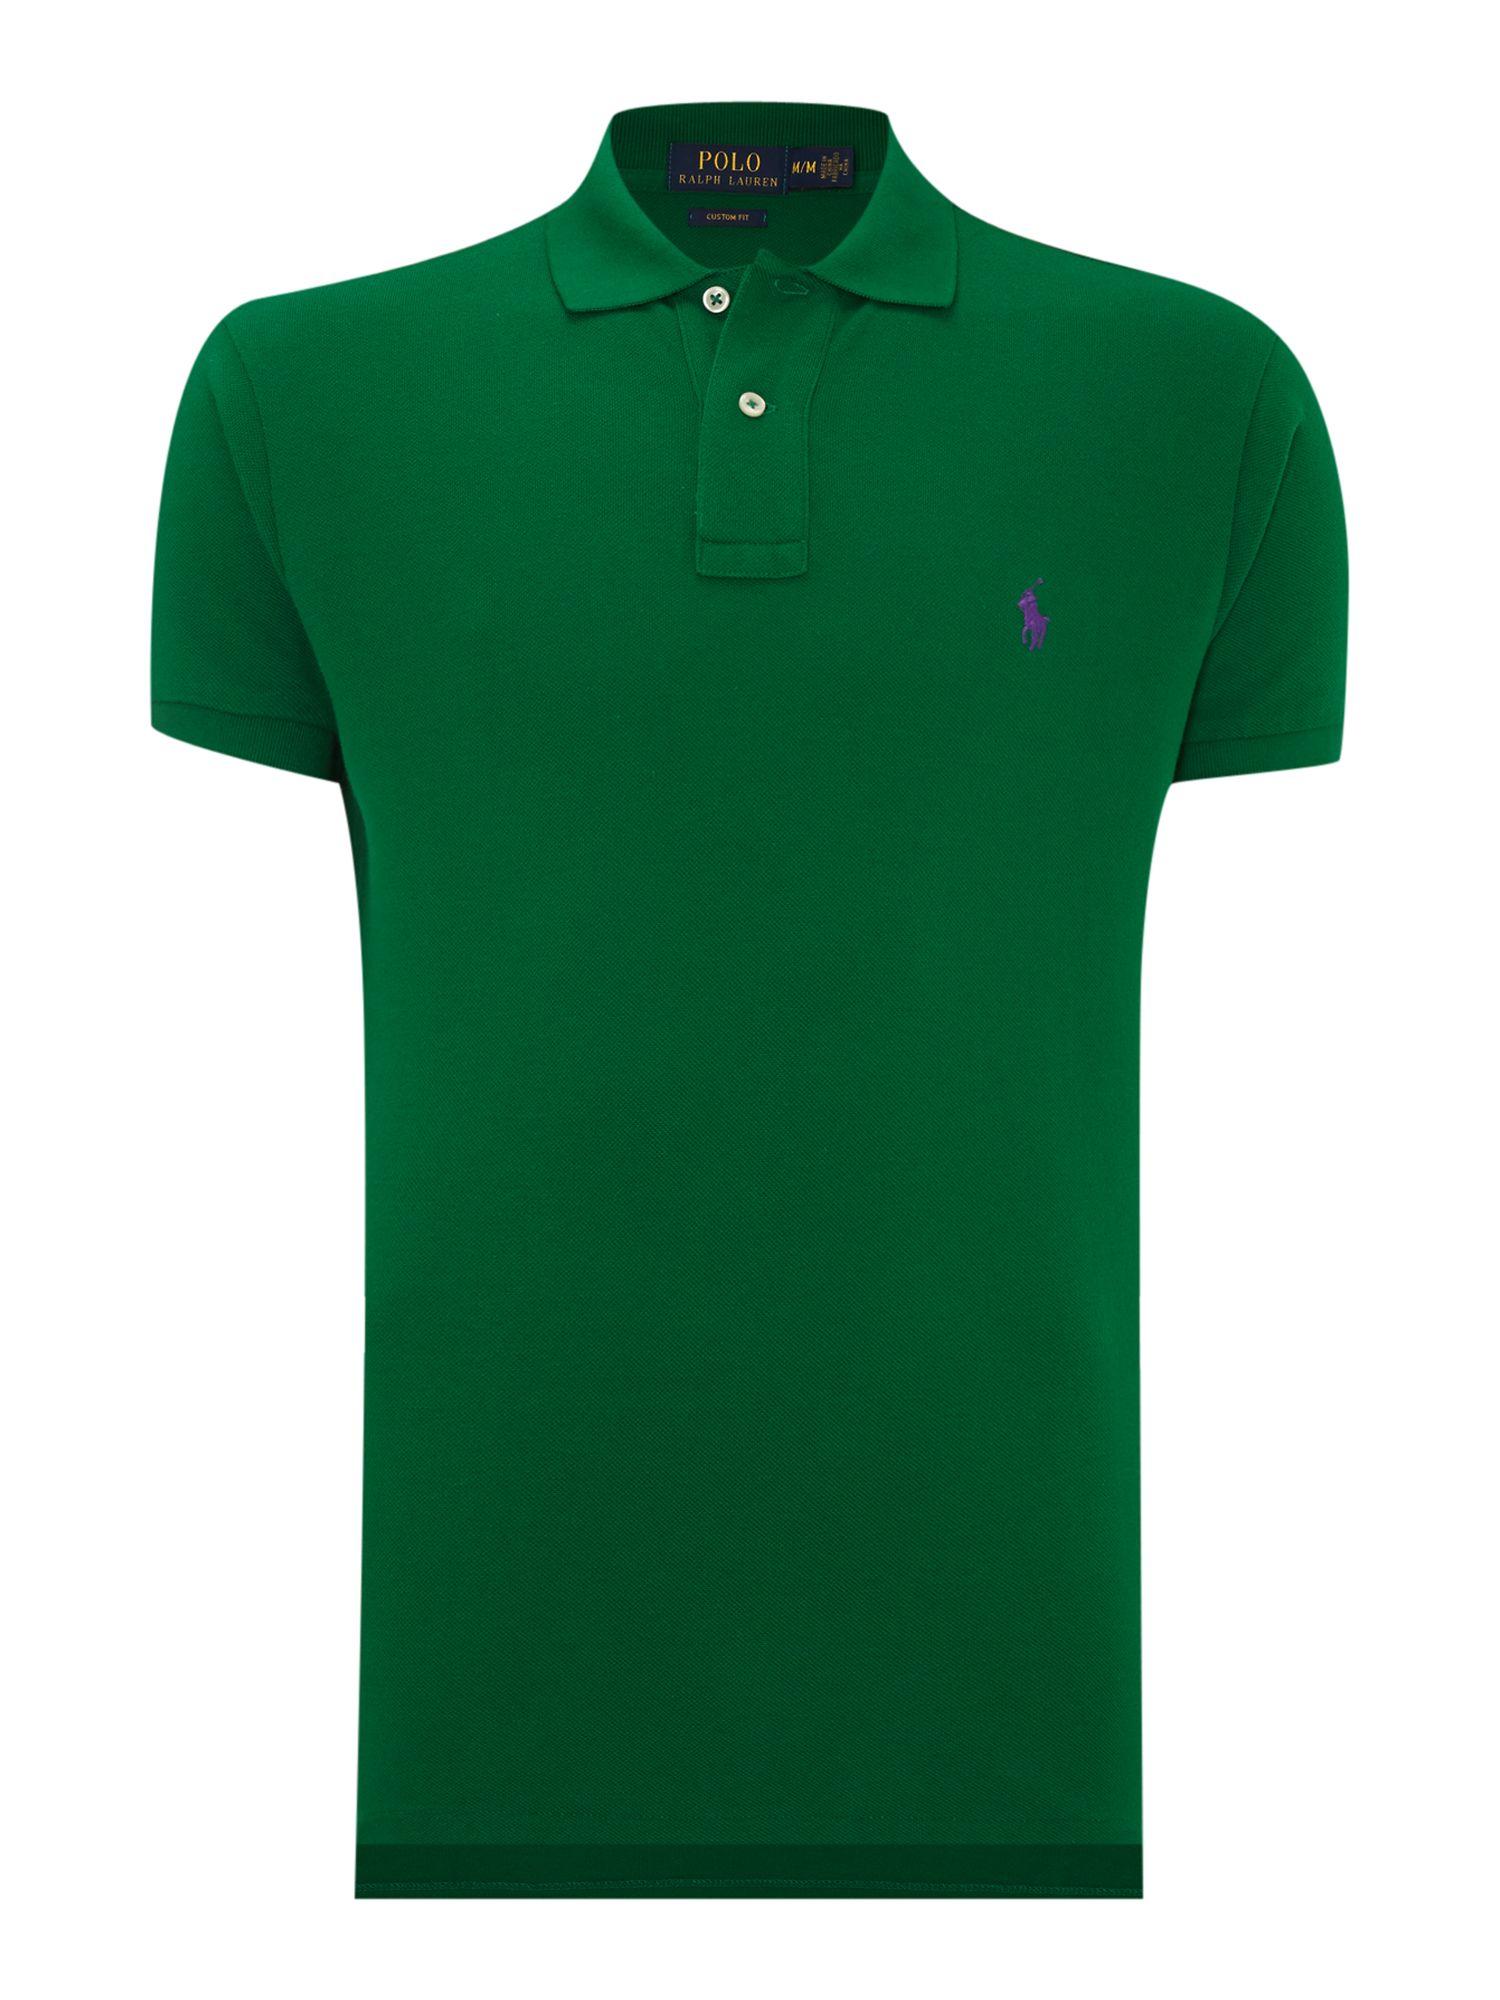 Polo ralph lauren custom fit short sleeve mesh polo shirt for Polo ralph lauren custom fit polo shirt